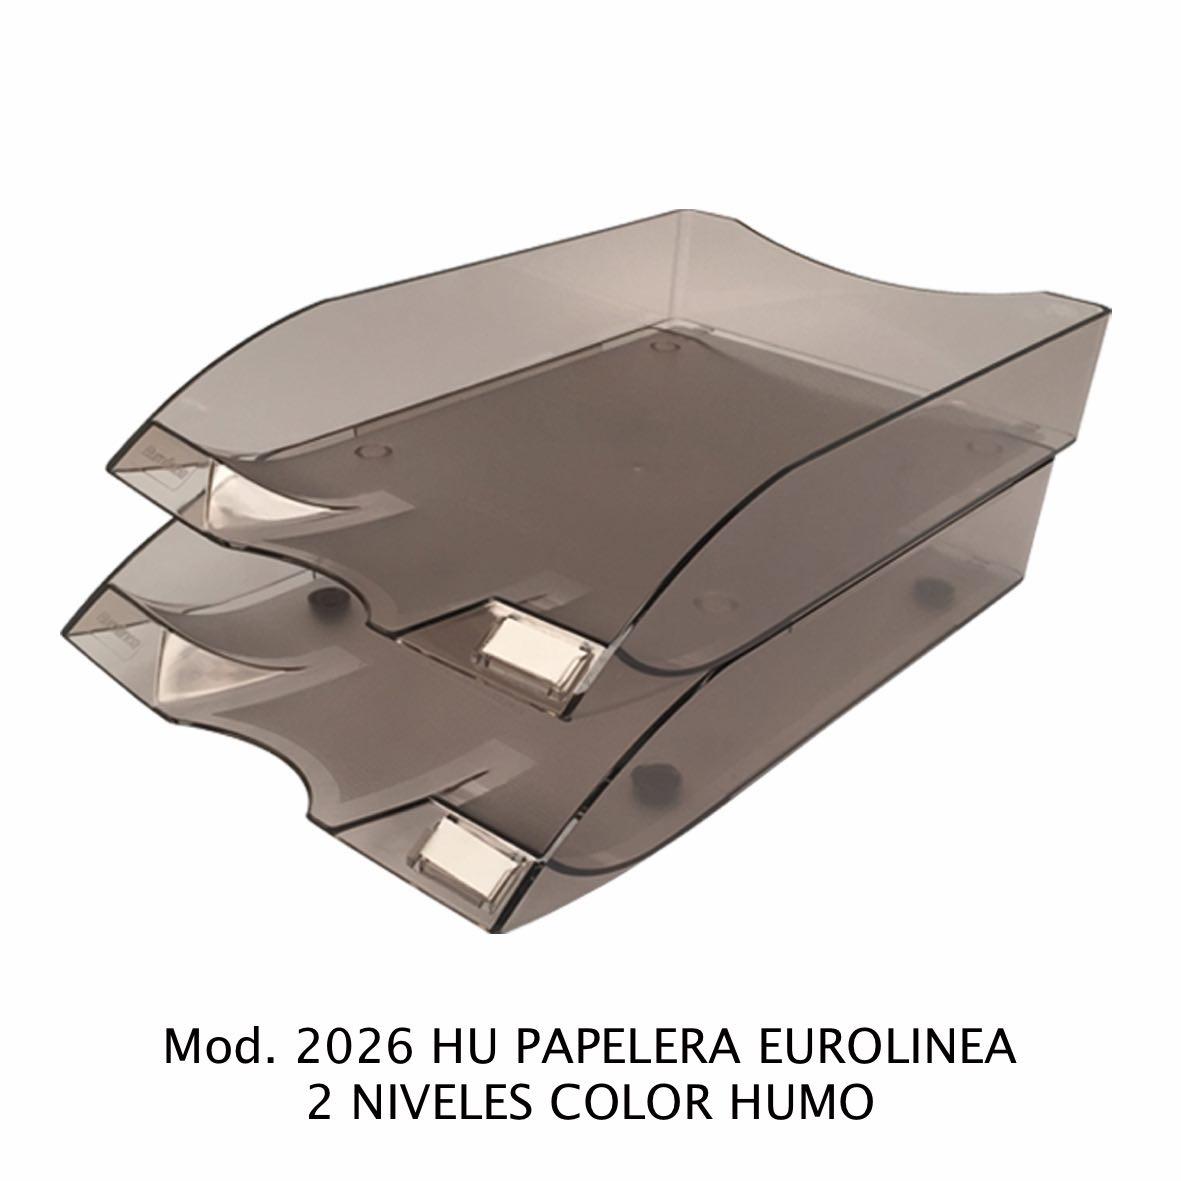 Charola de escritorio tamaño oficio de 2 niveles color humo Eurolínea Modelo 2026 HU - Sablón